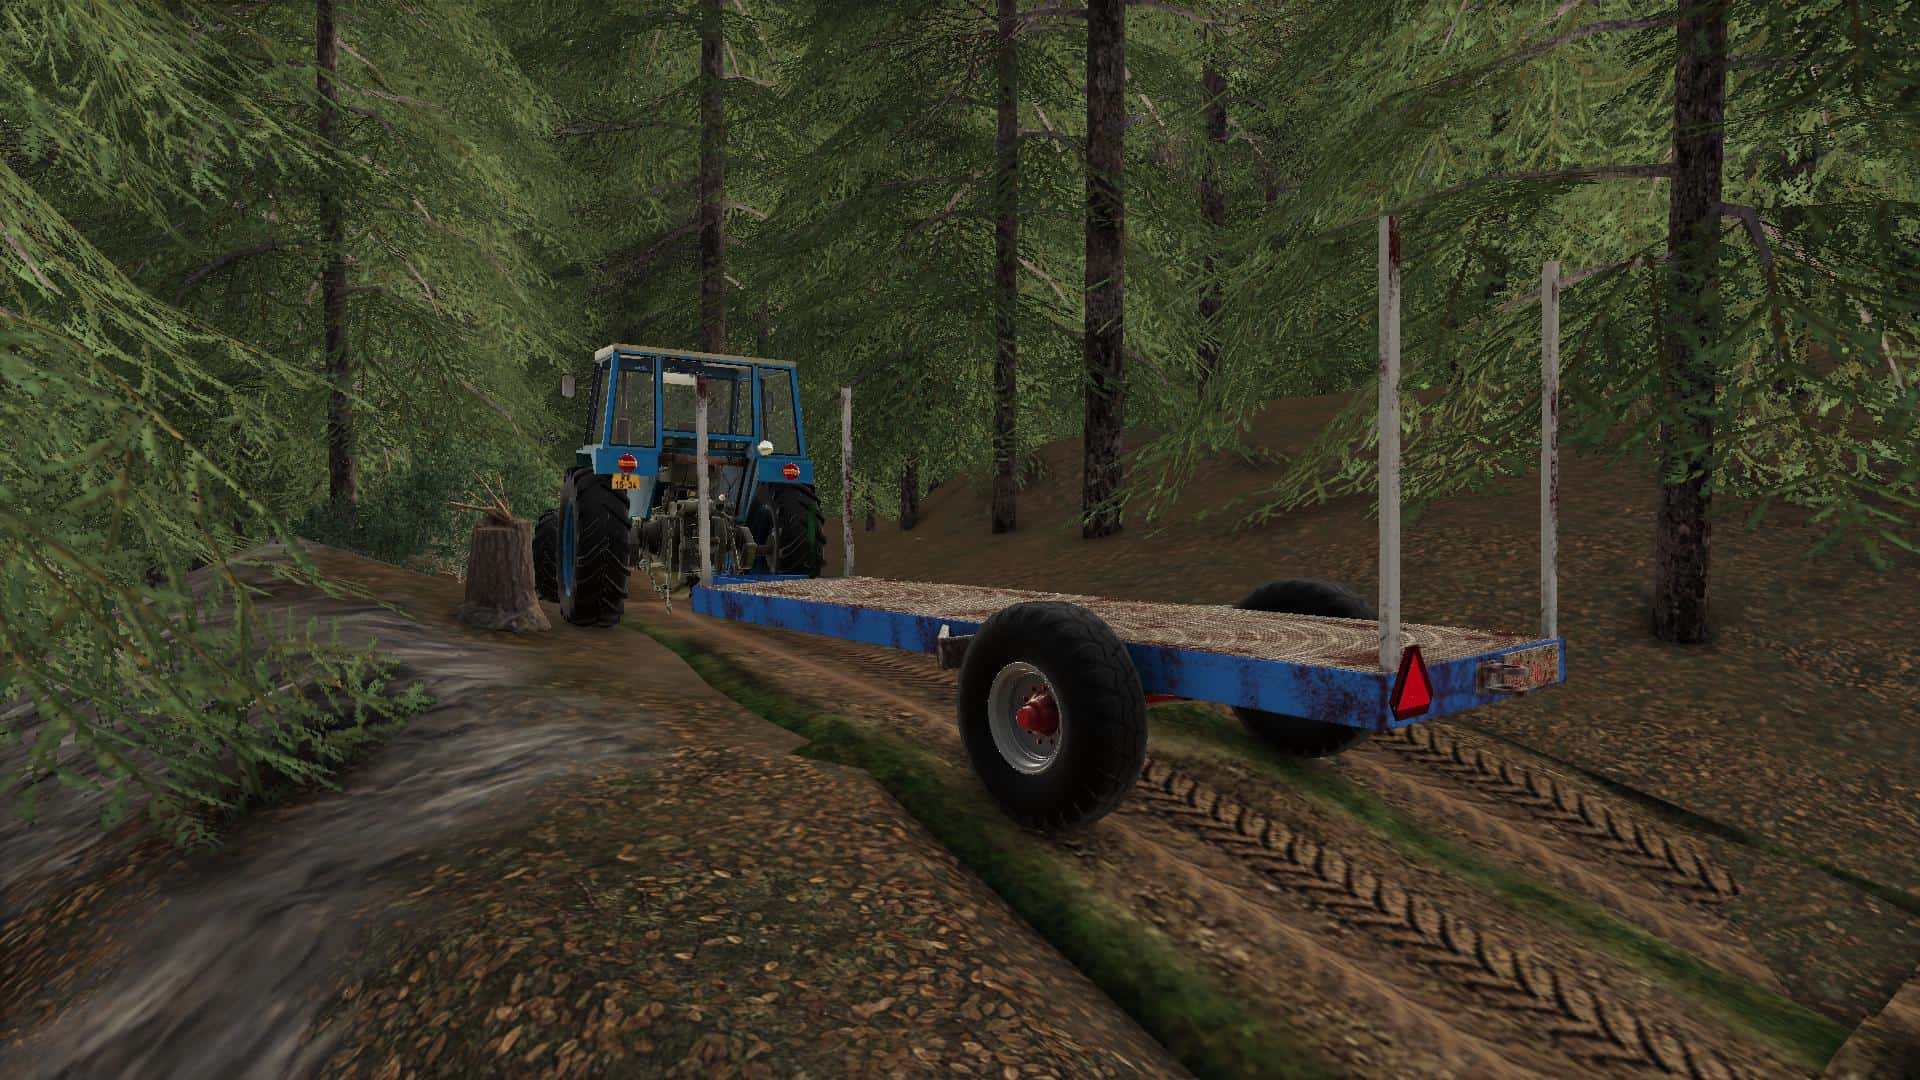 Remorque A Bois Fait Maison V1 0 Fs19 Farming Simulator 19 Mod Fs19 Mod